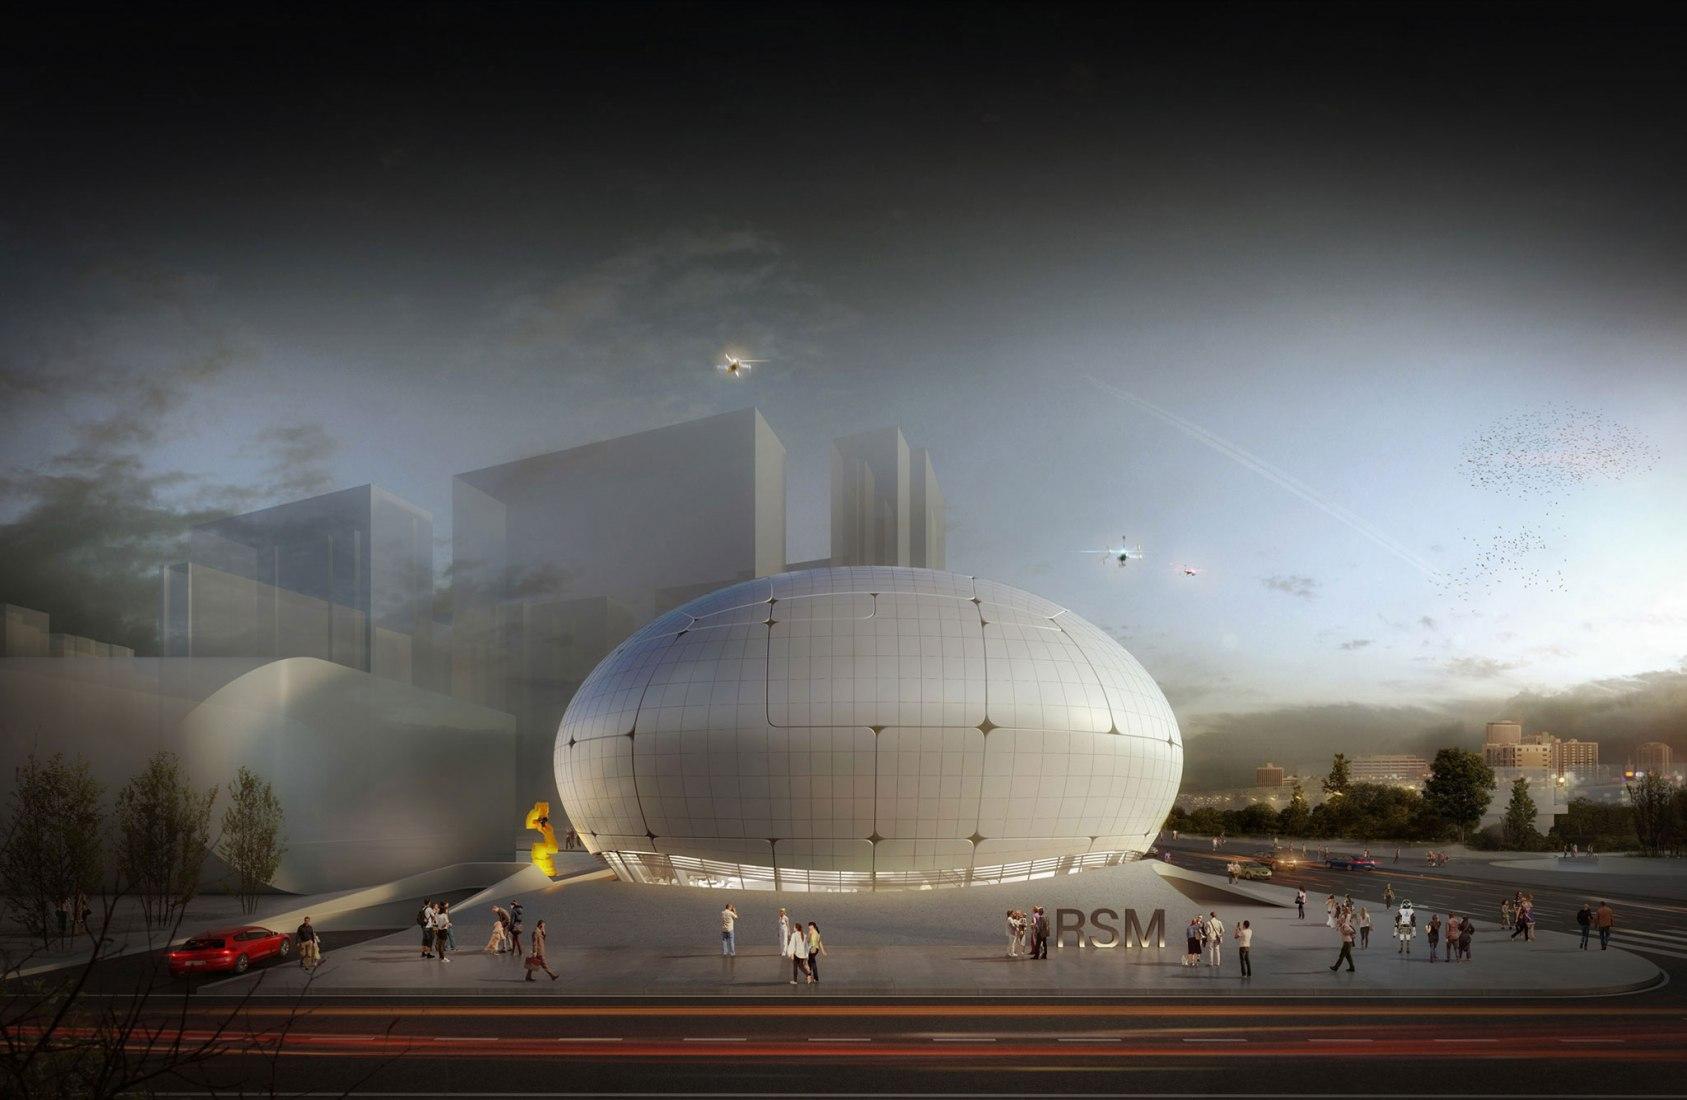 Exterior rendering view. Robot Science Museum by Melike Altınışık Architects